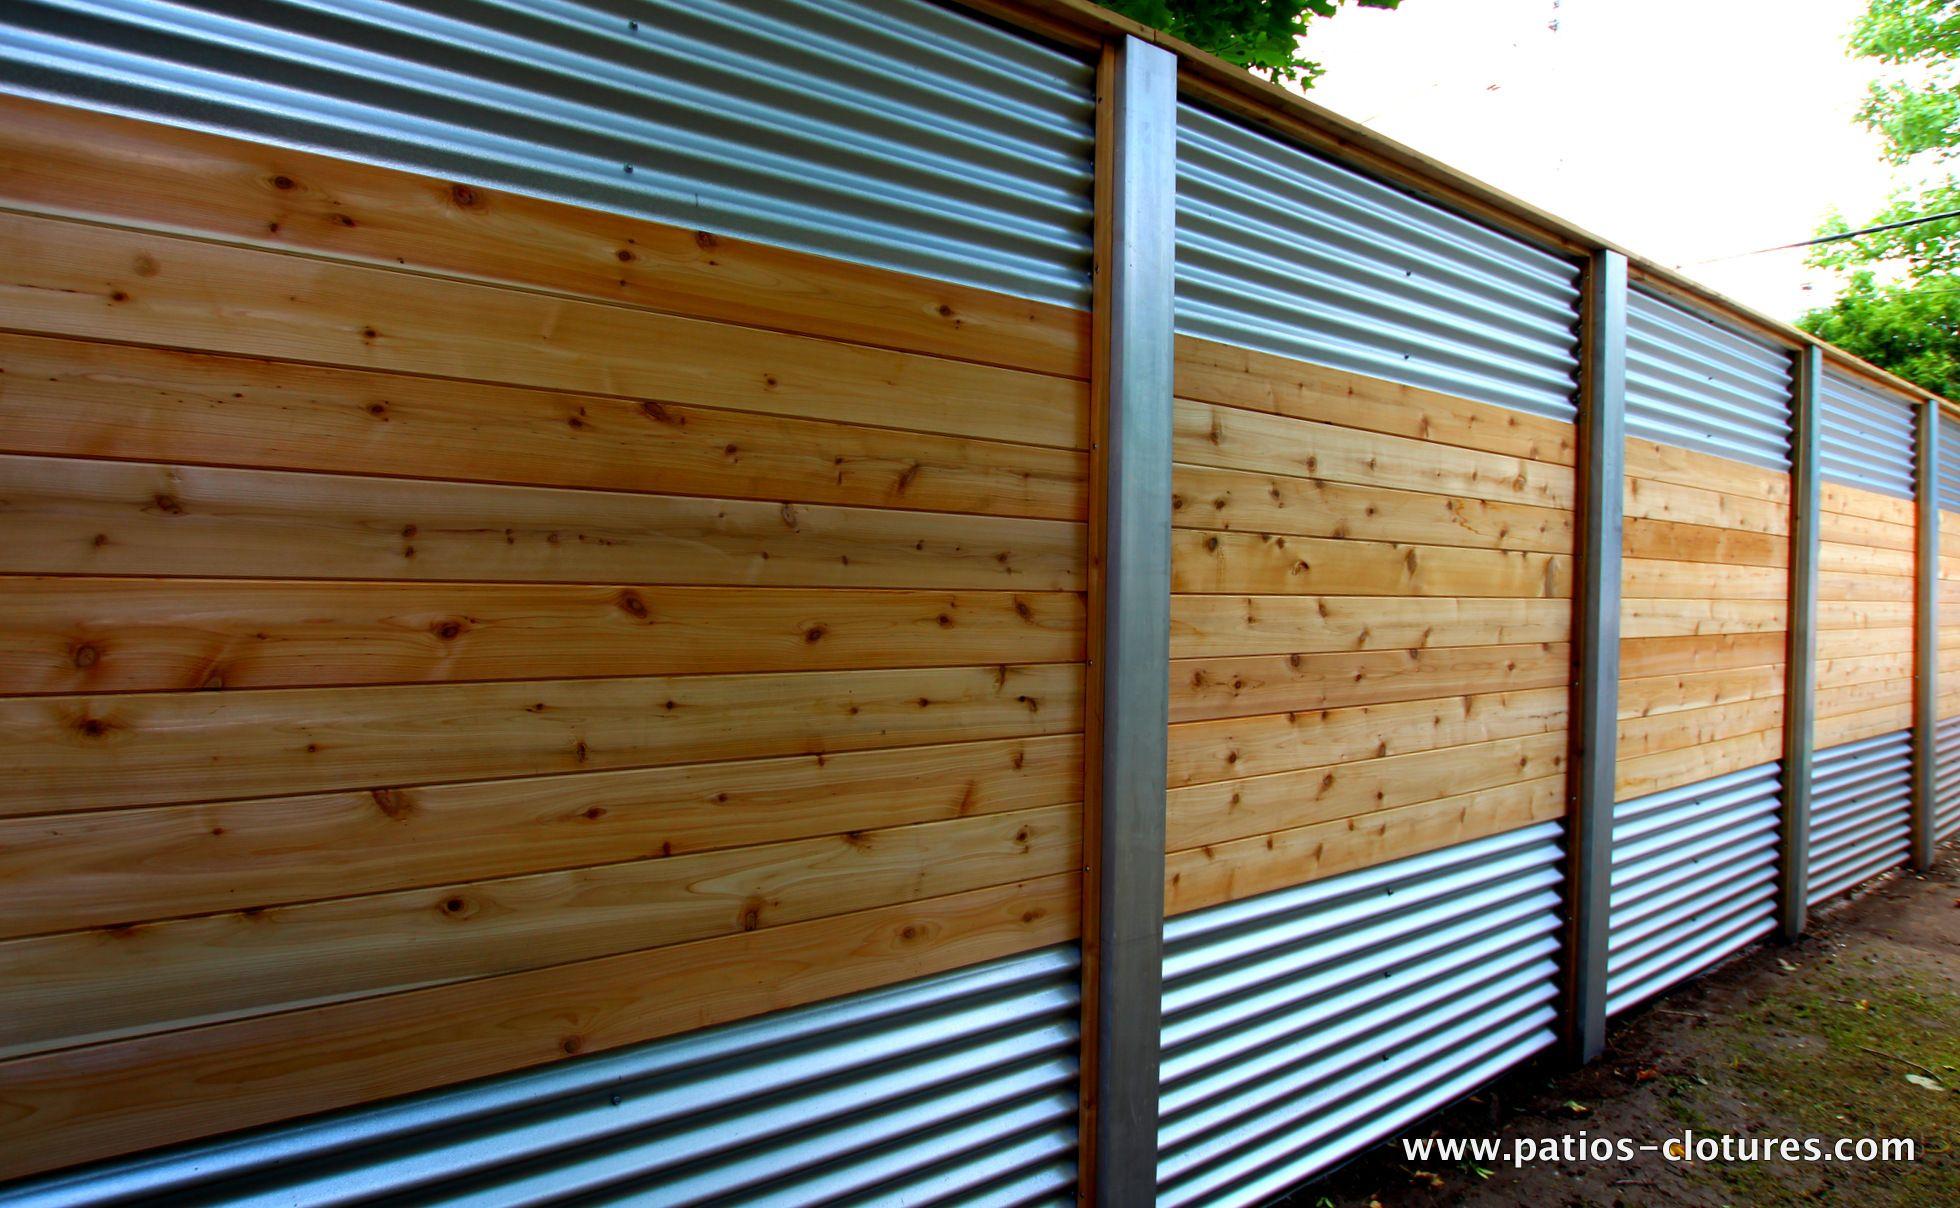 38+ Galvanized tin privacy fence ideas in 2021